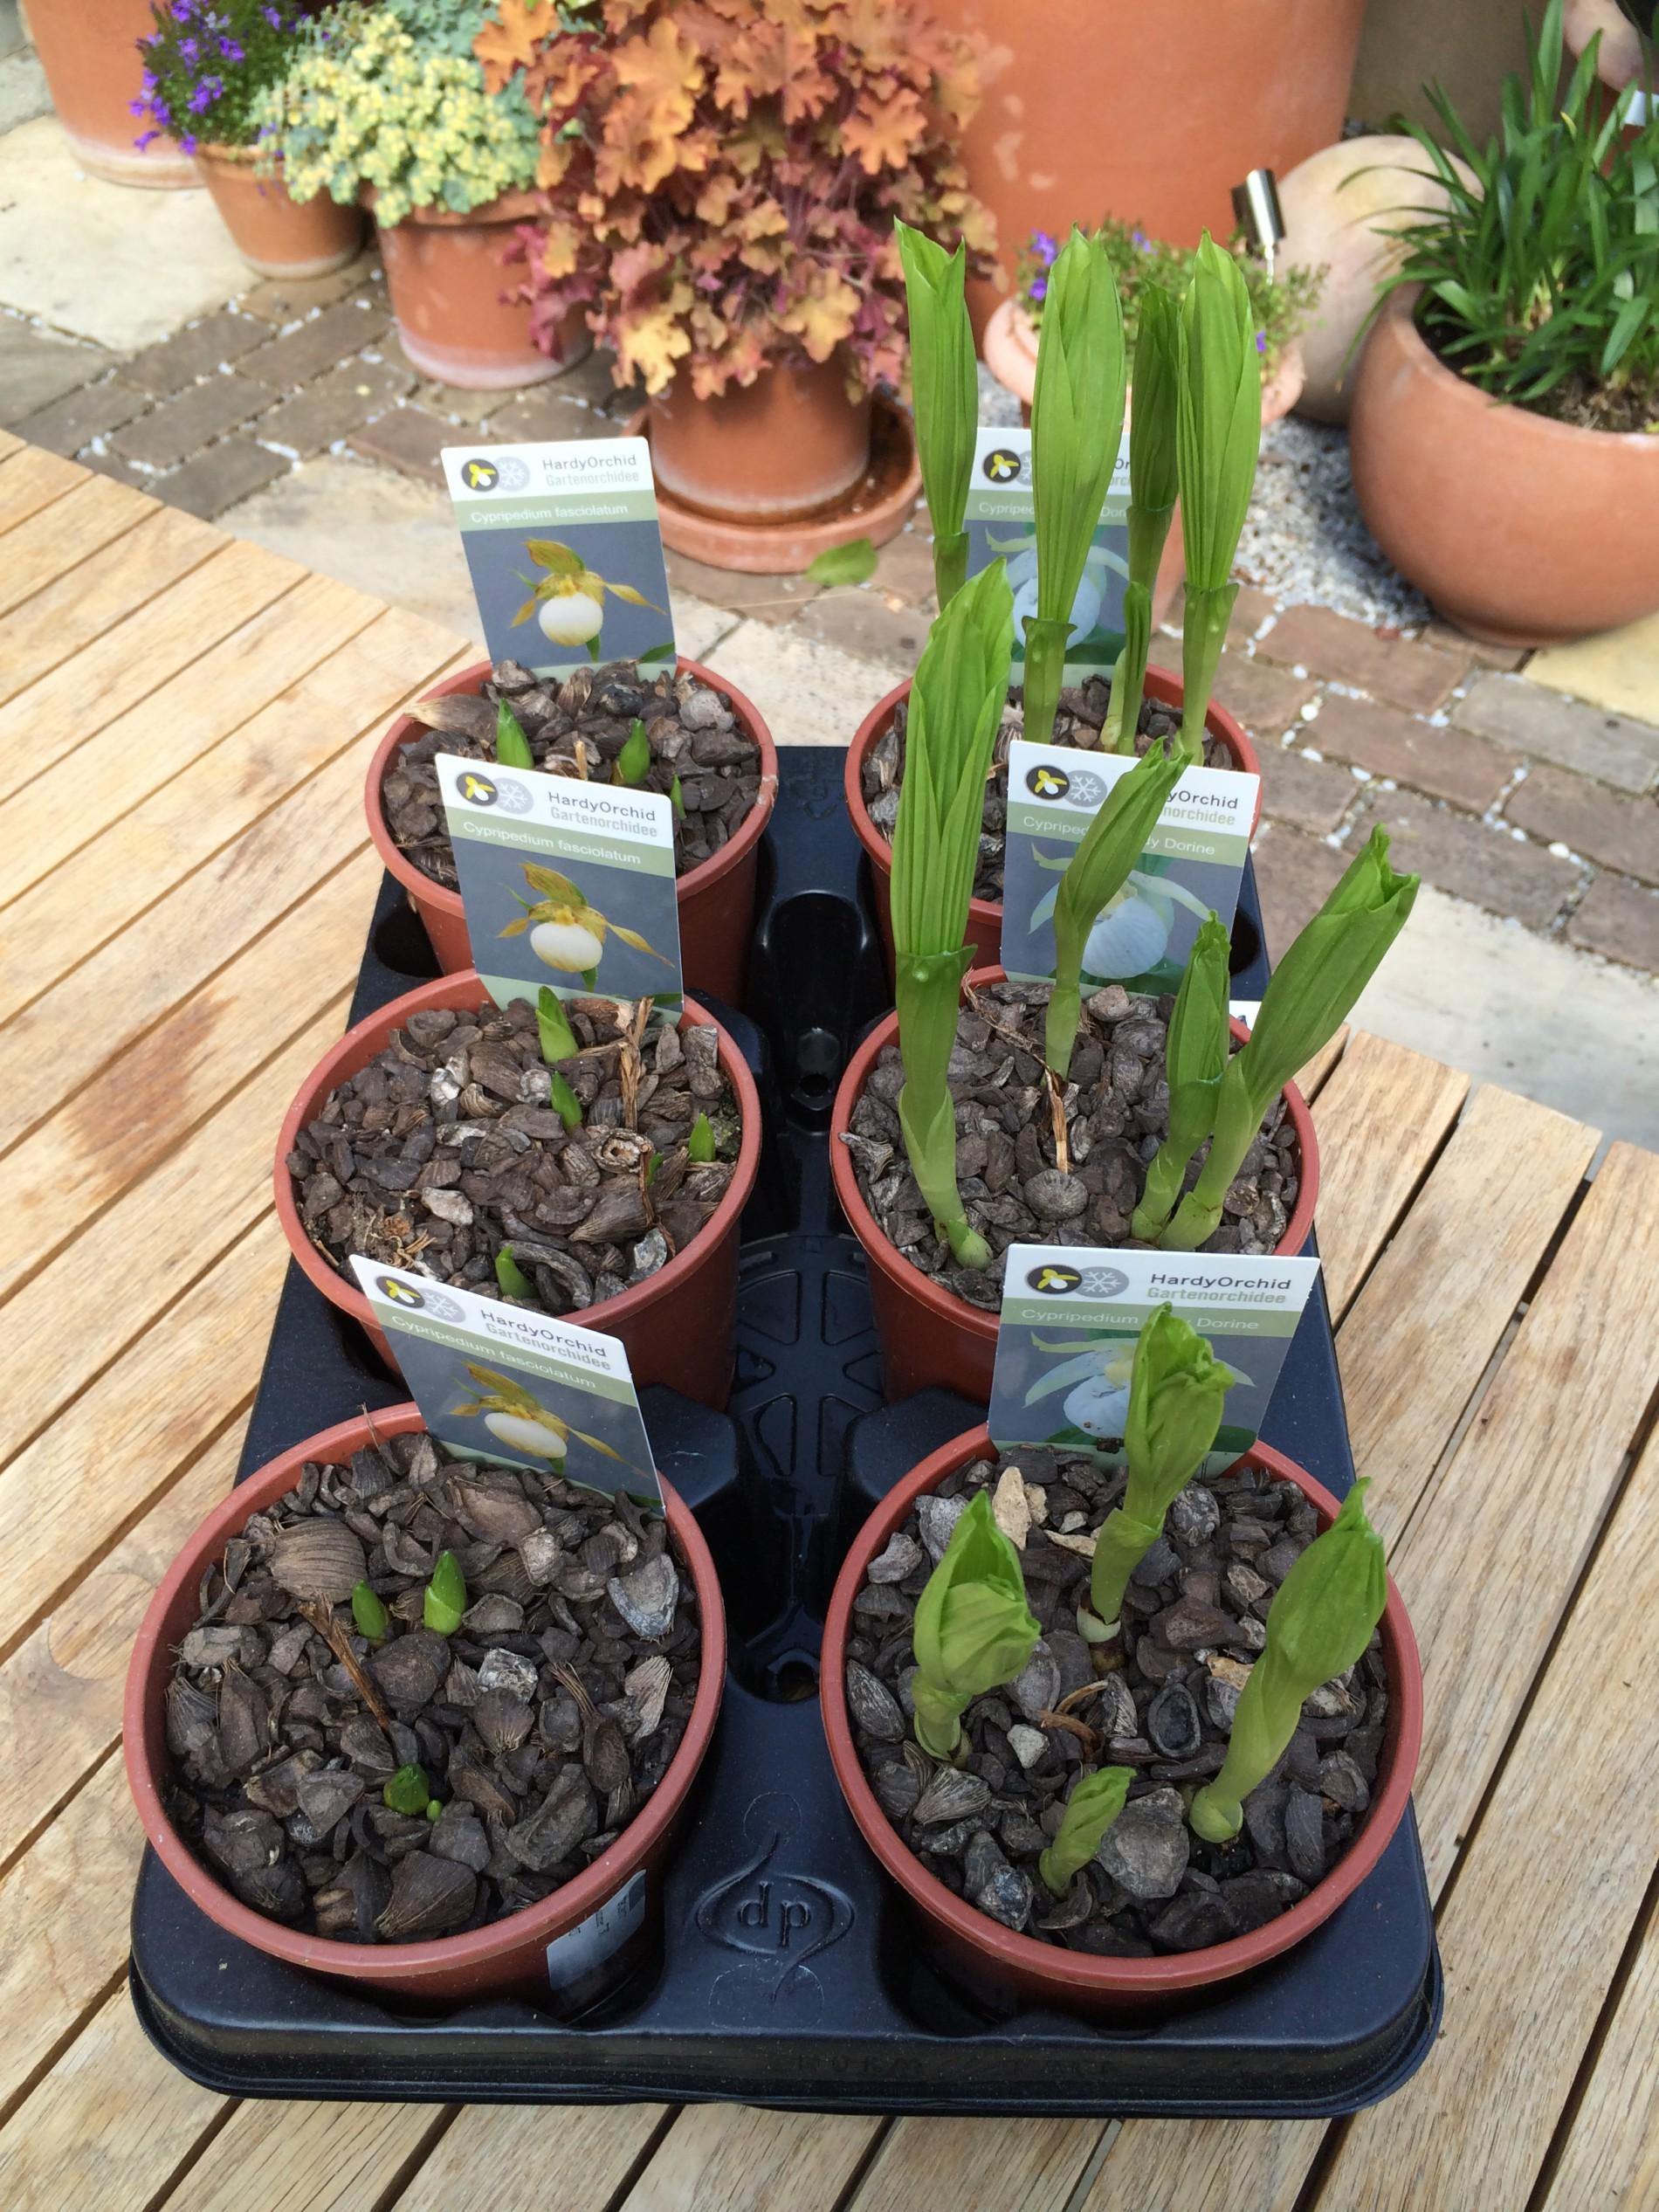 Gartenorchideen Hardyorchid